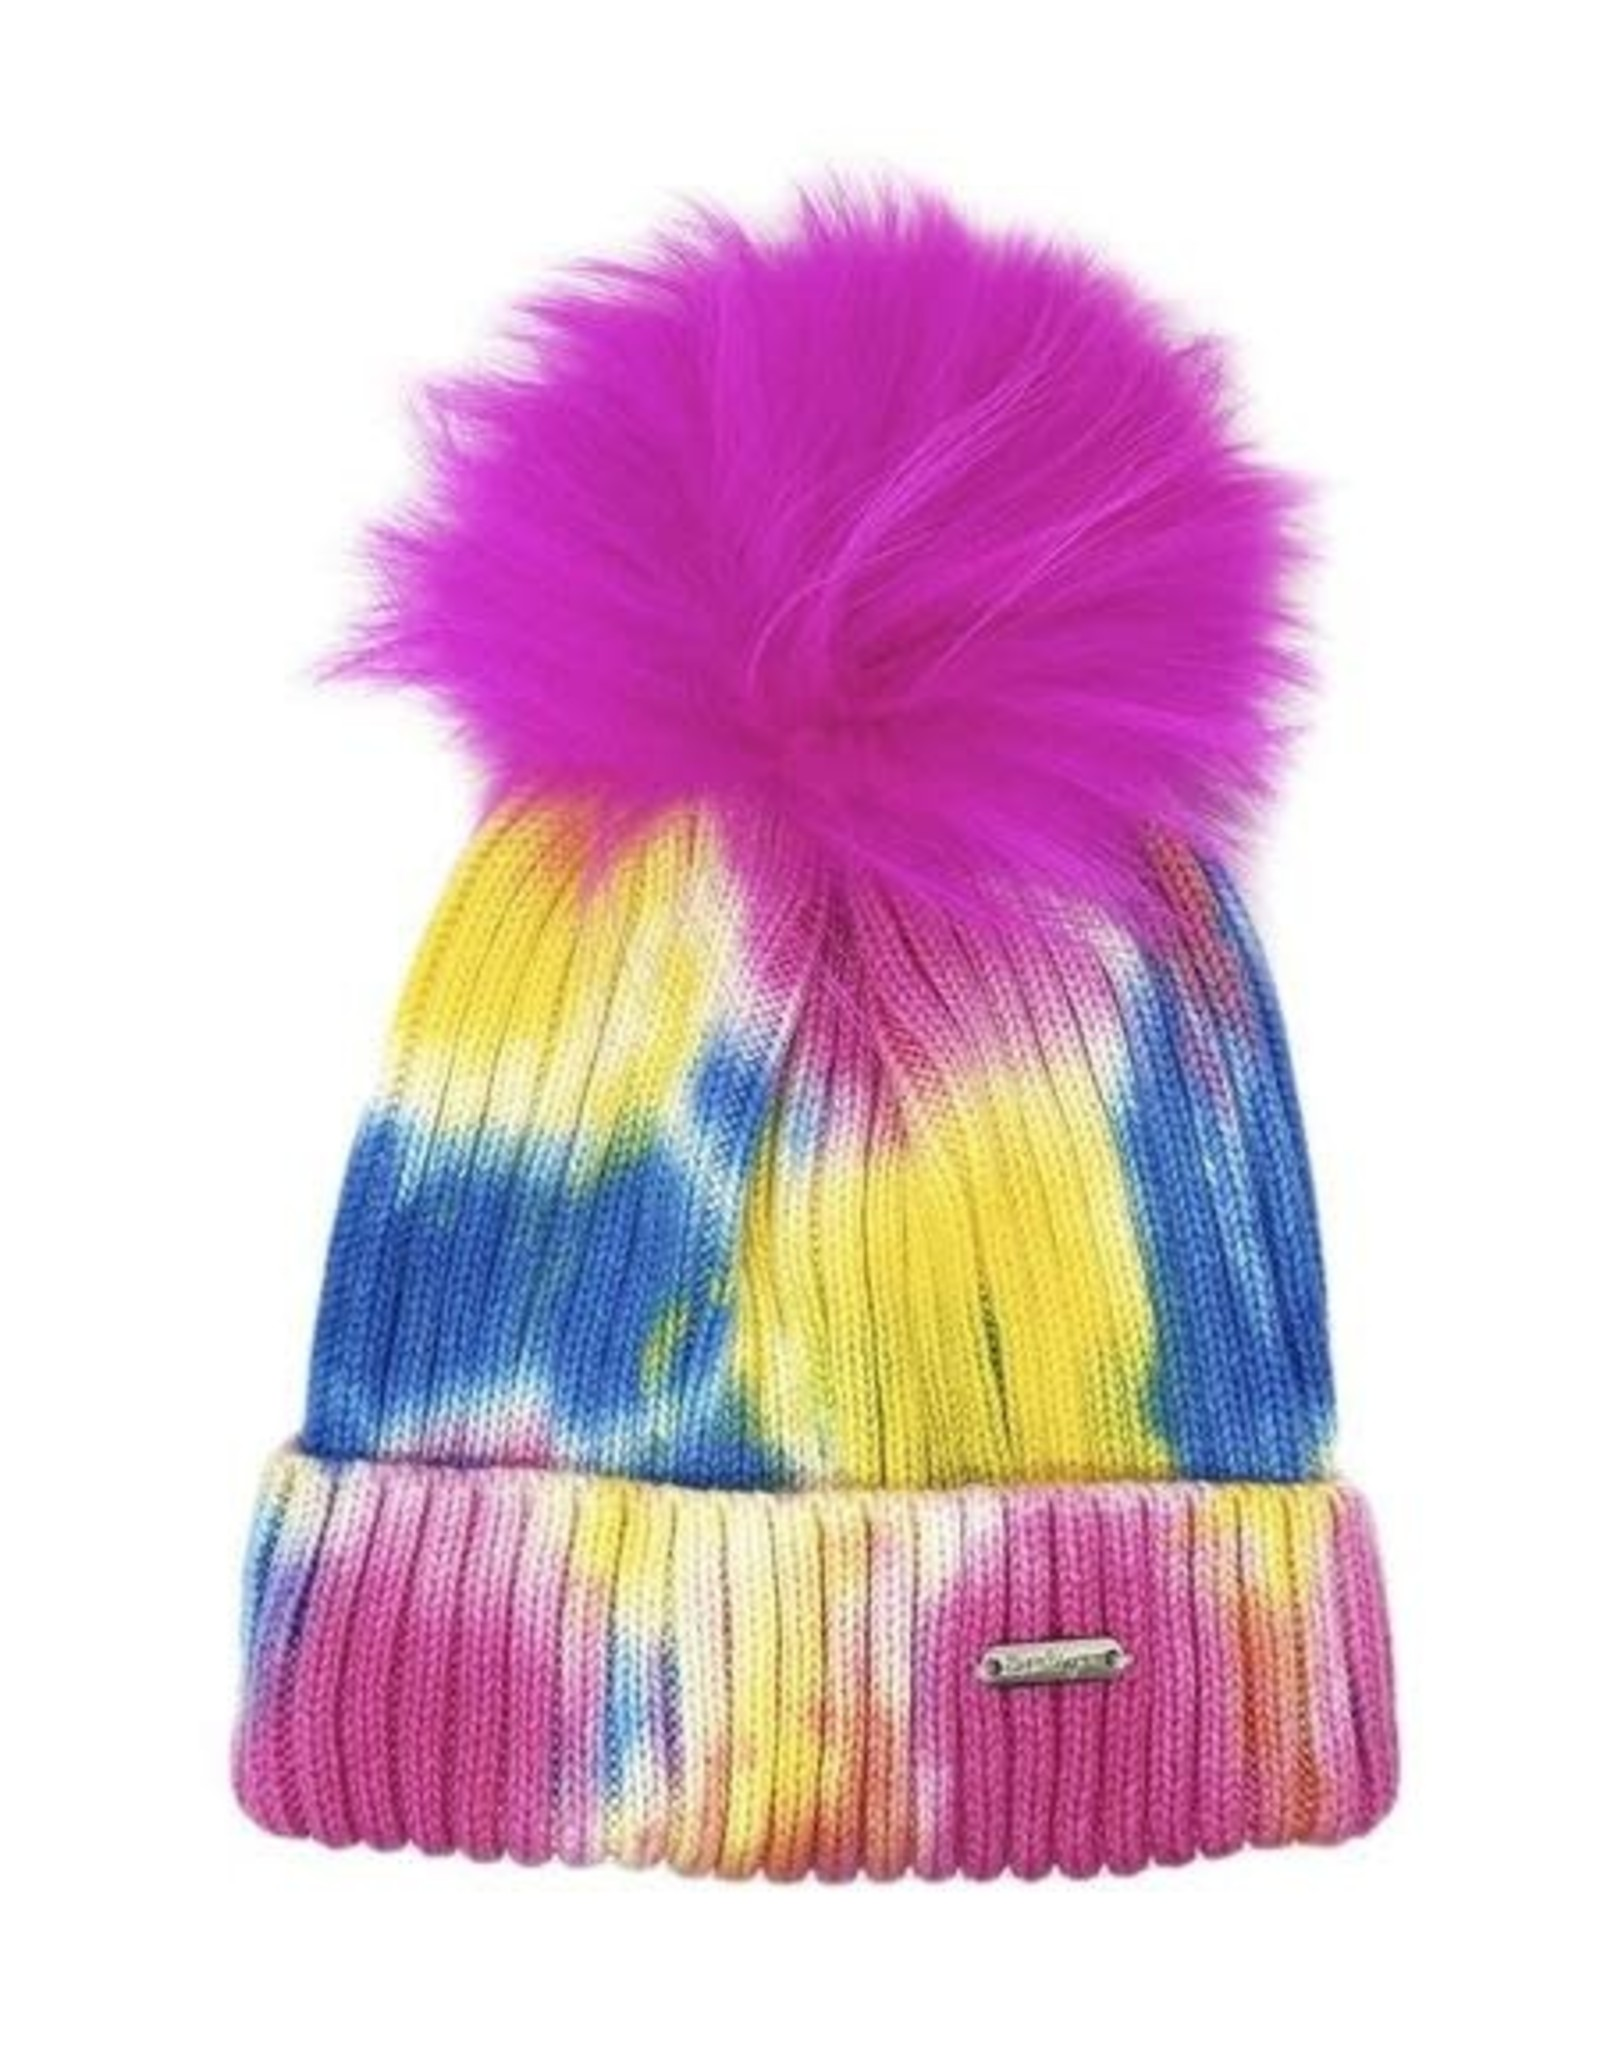 Bari Lynn Tie Dye Winter Hat Neon